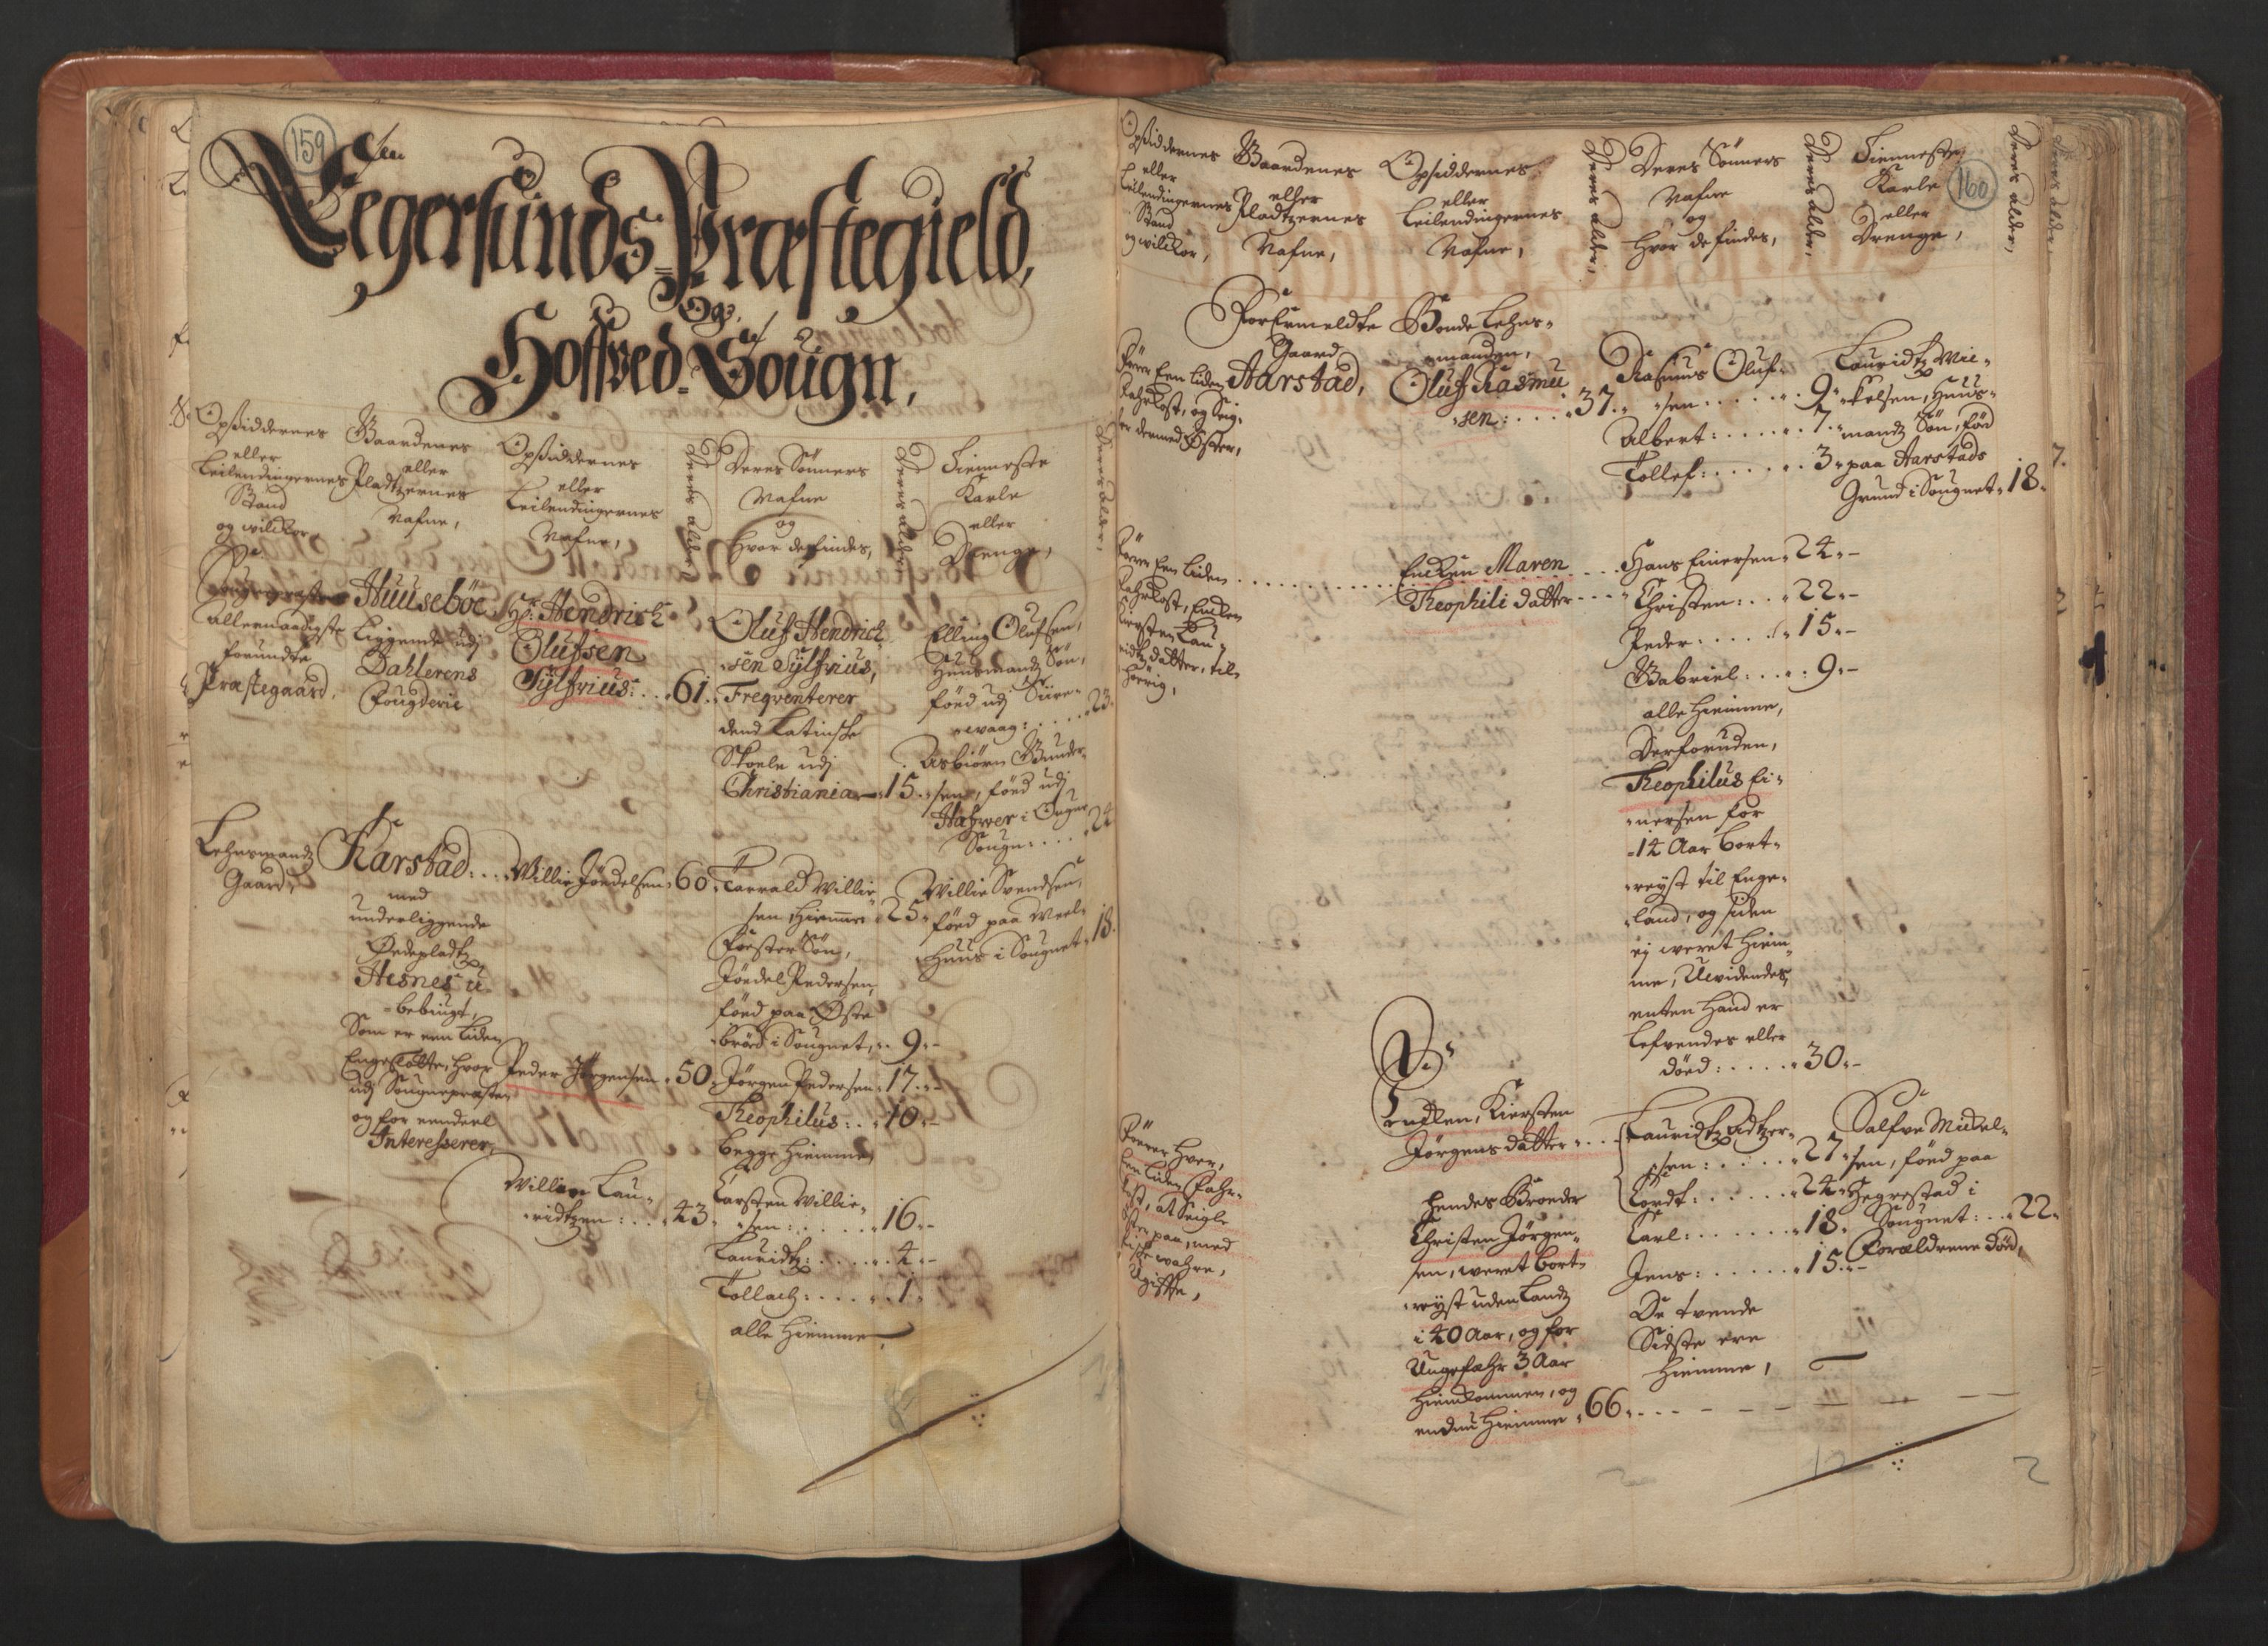 RA, Manntallet 1701, nr. 4: Jæren og Dalane fogderi, 1701, s. 159-160